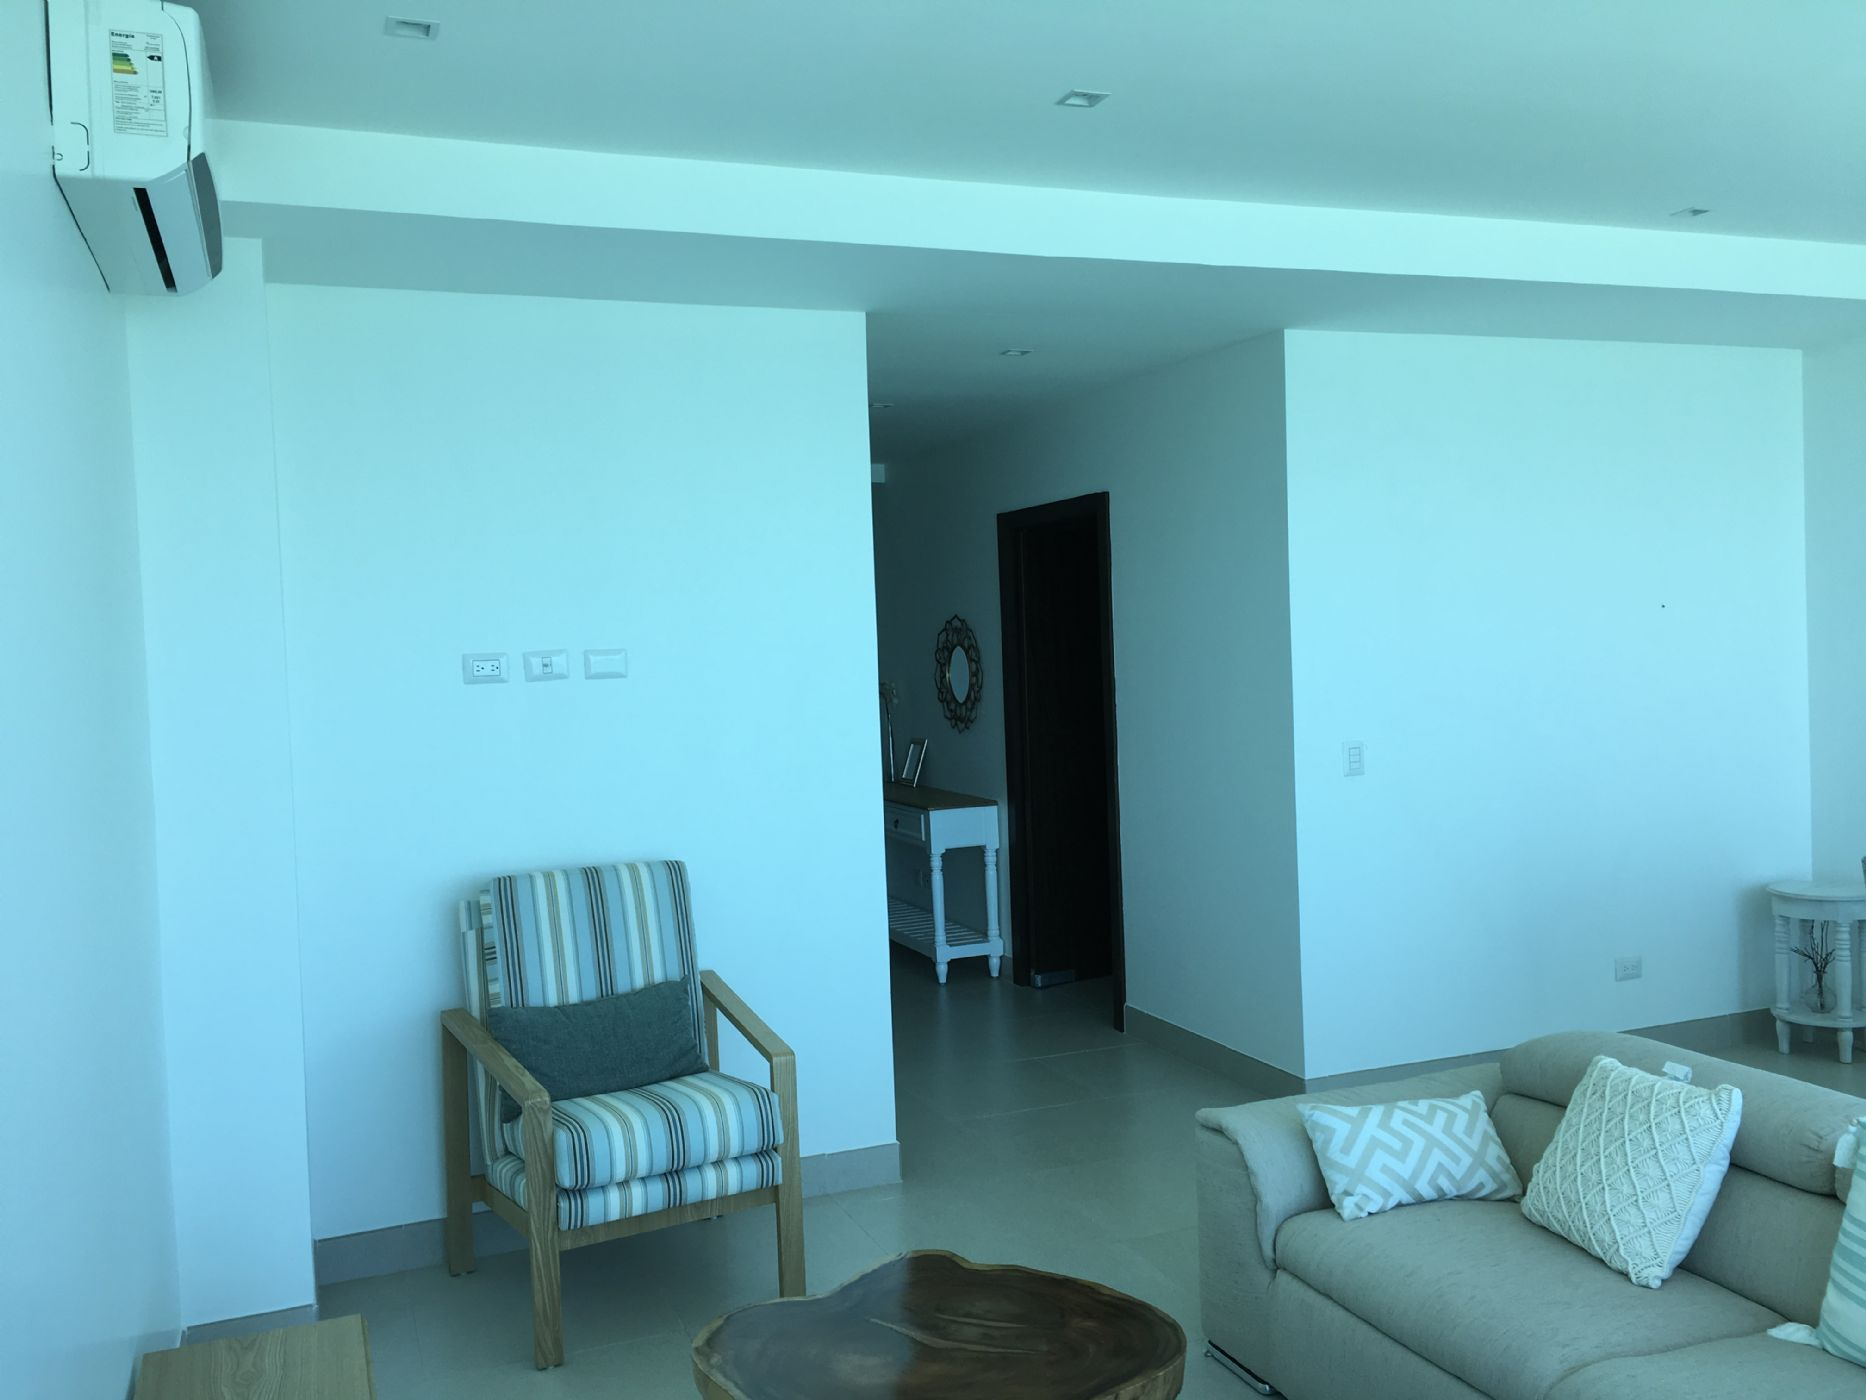 Petropolis-Ecuador-property-492551-9.JPG